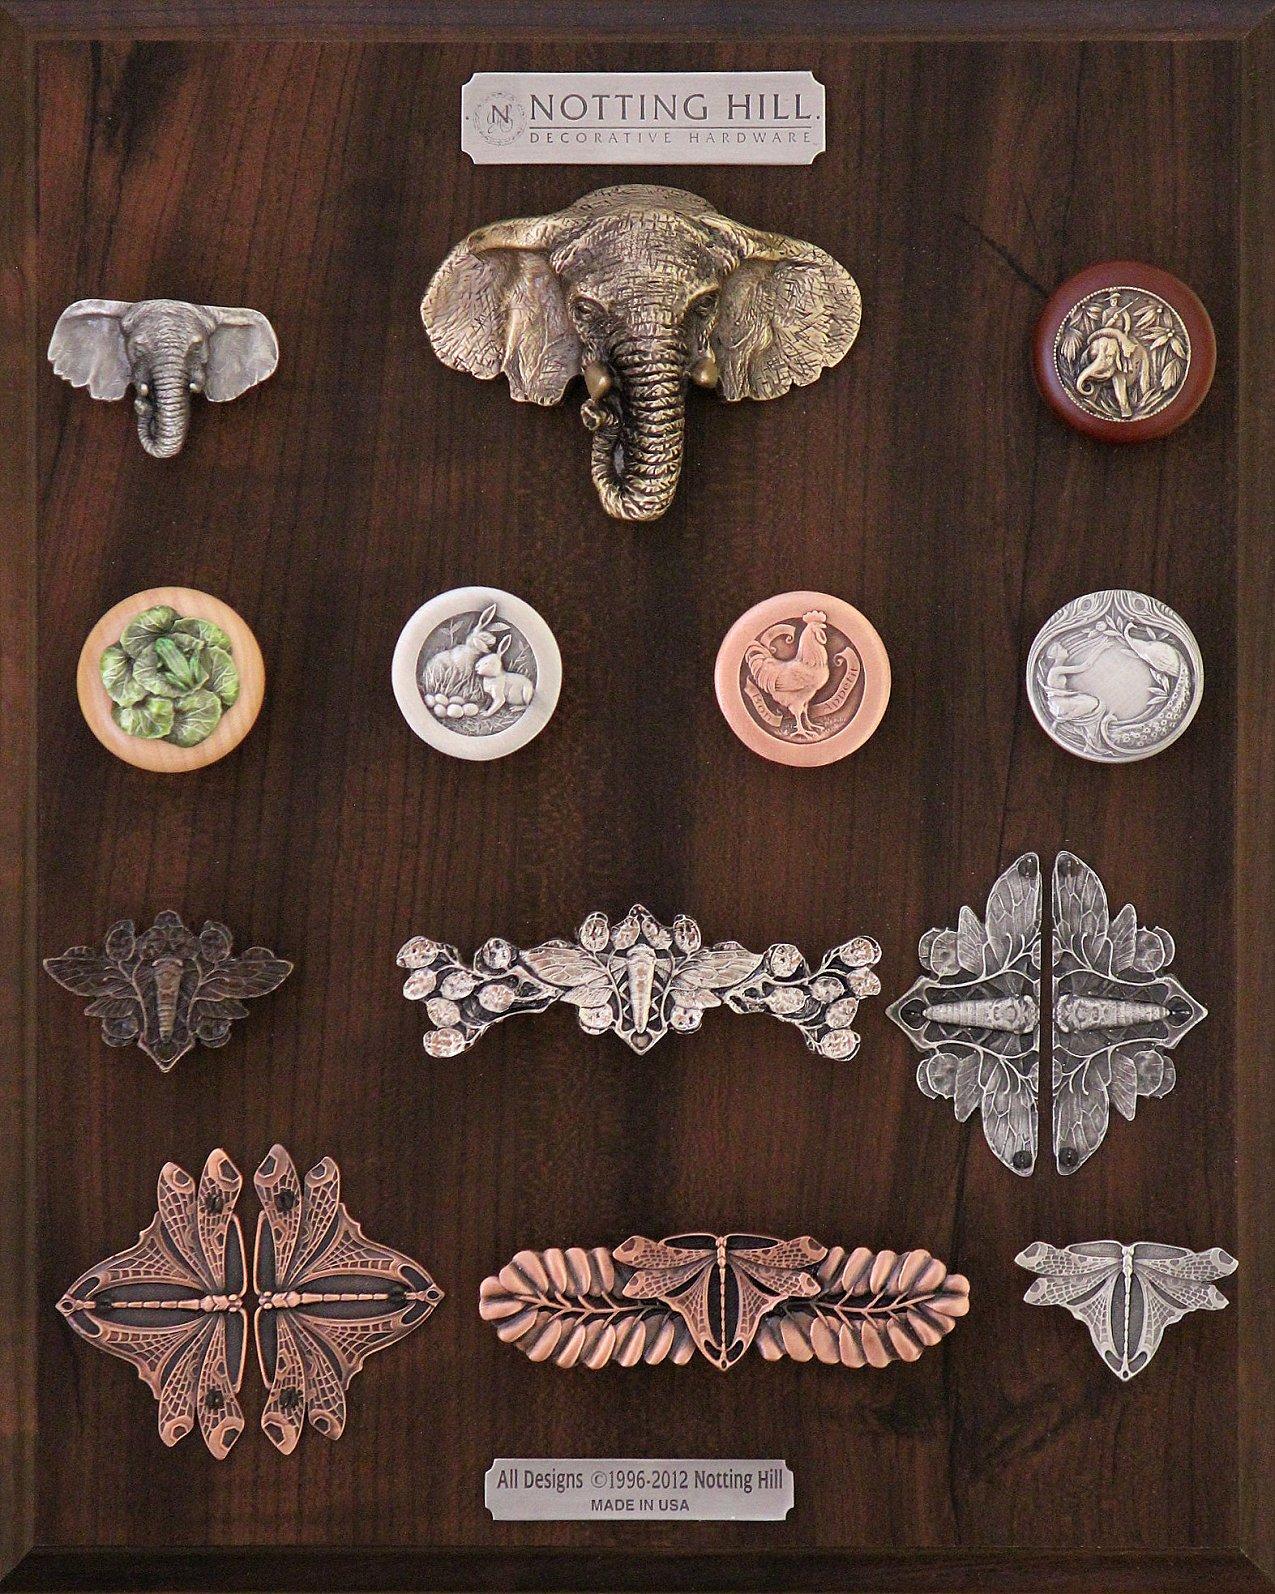 Goliath (Elephant) Knob, Bin Pull; Jungle Patrol Wood Knob, Leap Frog Wood Knob, Rabbits Knob, Rooster Knob, Peacock Lady Knob, Cicada Knob, Pull, Hinge Plate Set; Dragonfly Hinge Plate Set, Pull, Knob.